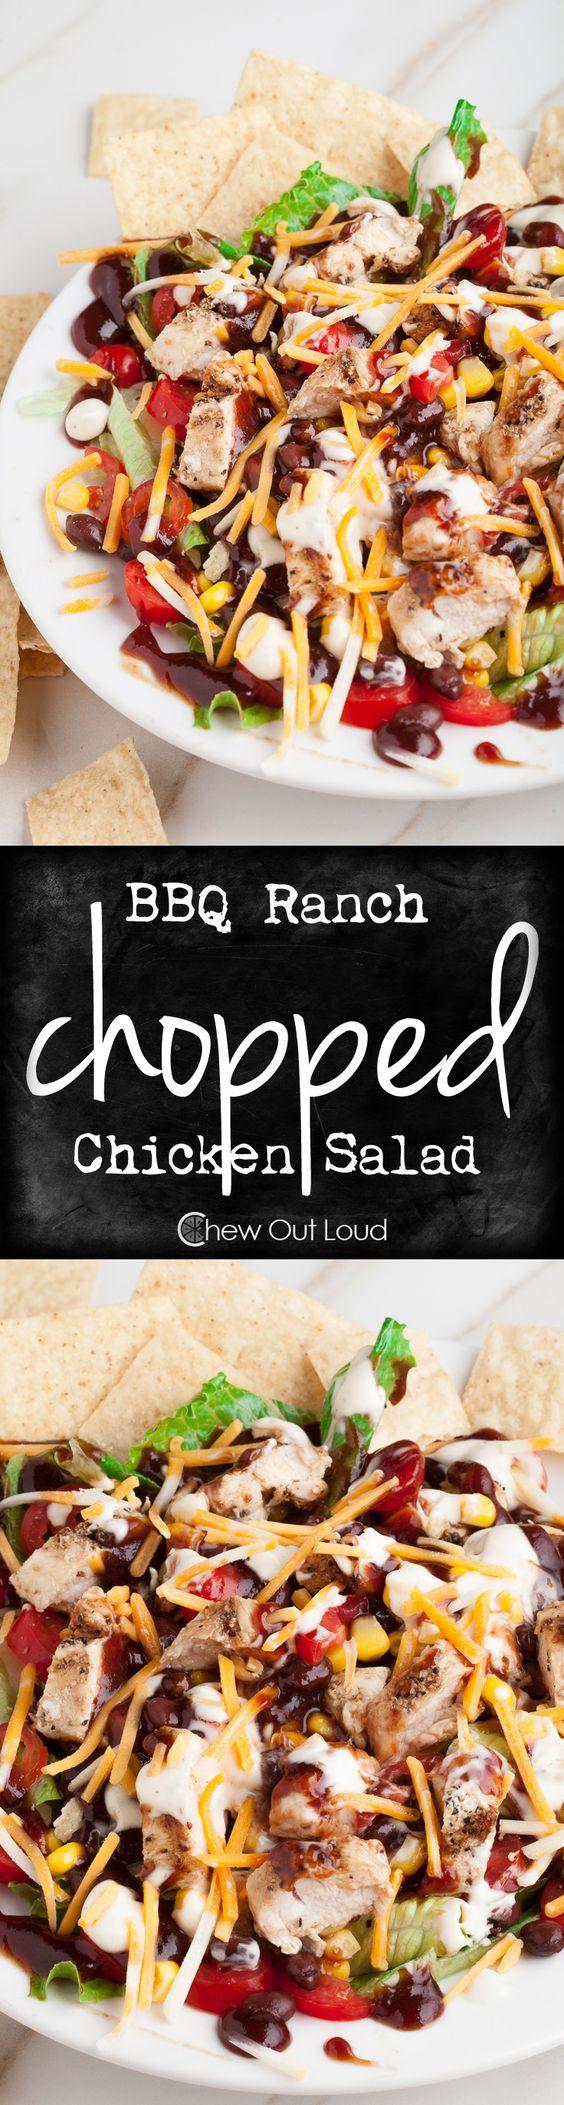 Simple chicken salad dressing recipe